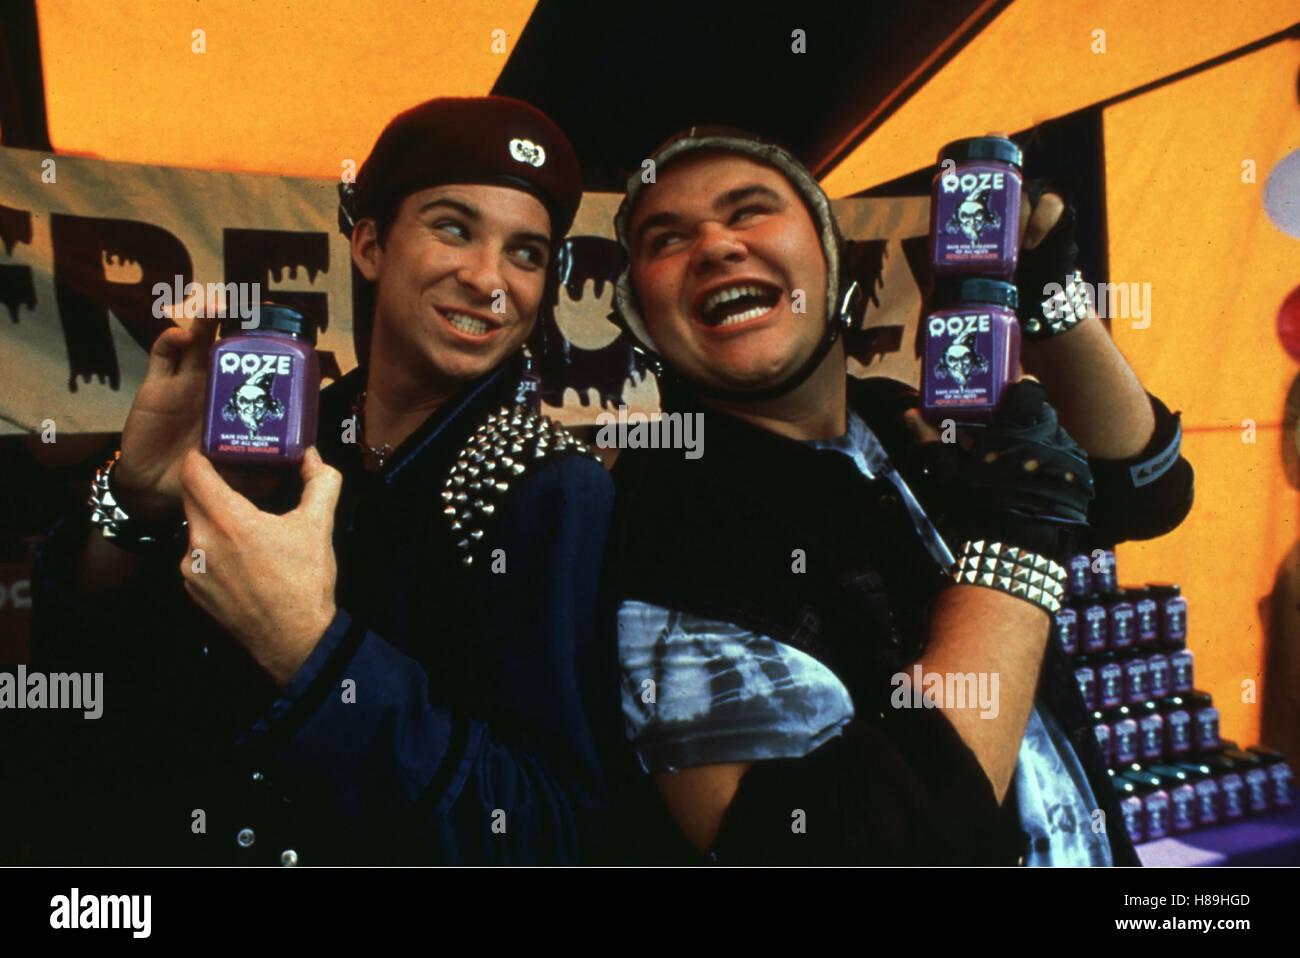 Power Rangers - Der Film, (MIGHTY MORPHIN POWER RANGERS - THE MOVIE), USA 1995, Regie: Bryan Spicer, JASON NARVY, - Stock Image